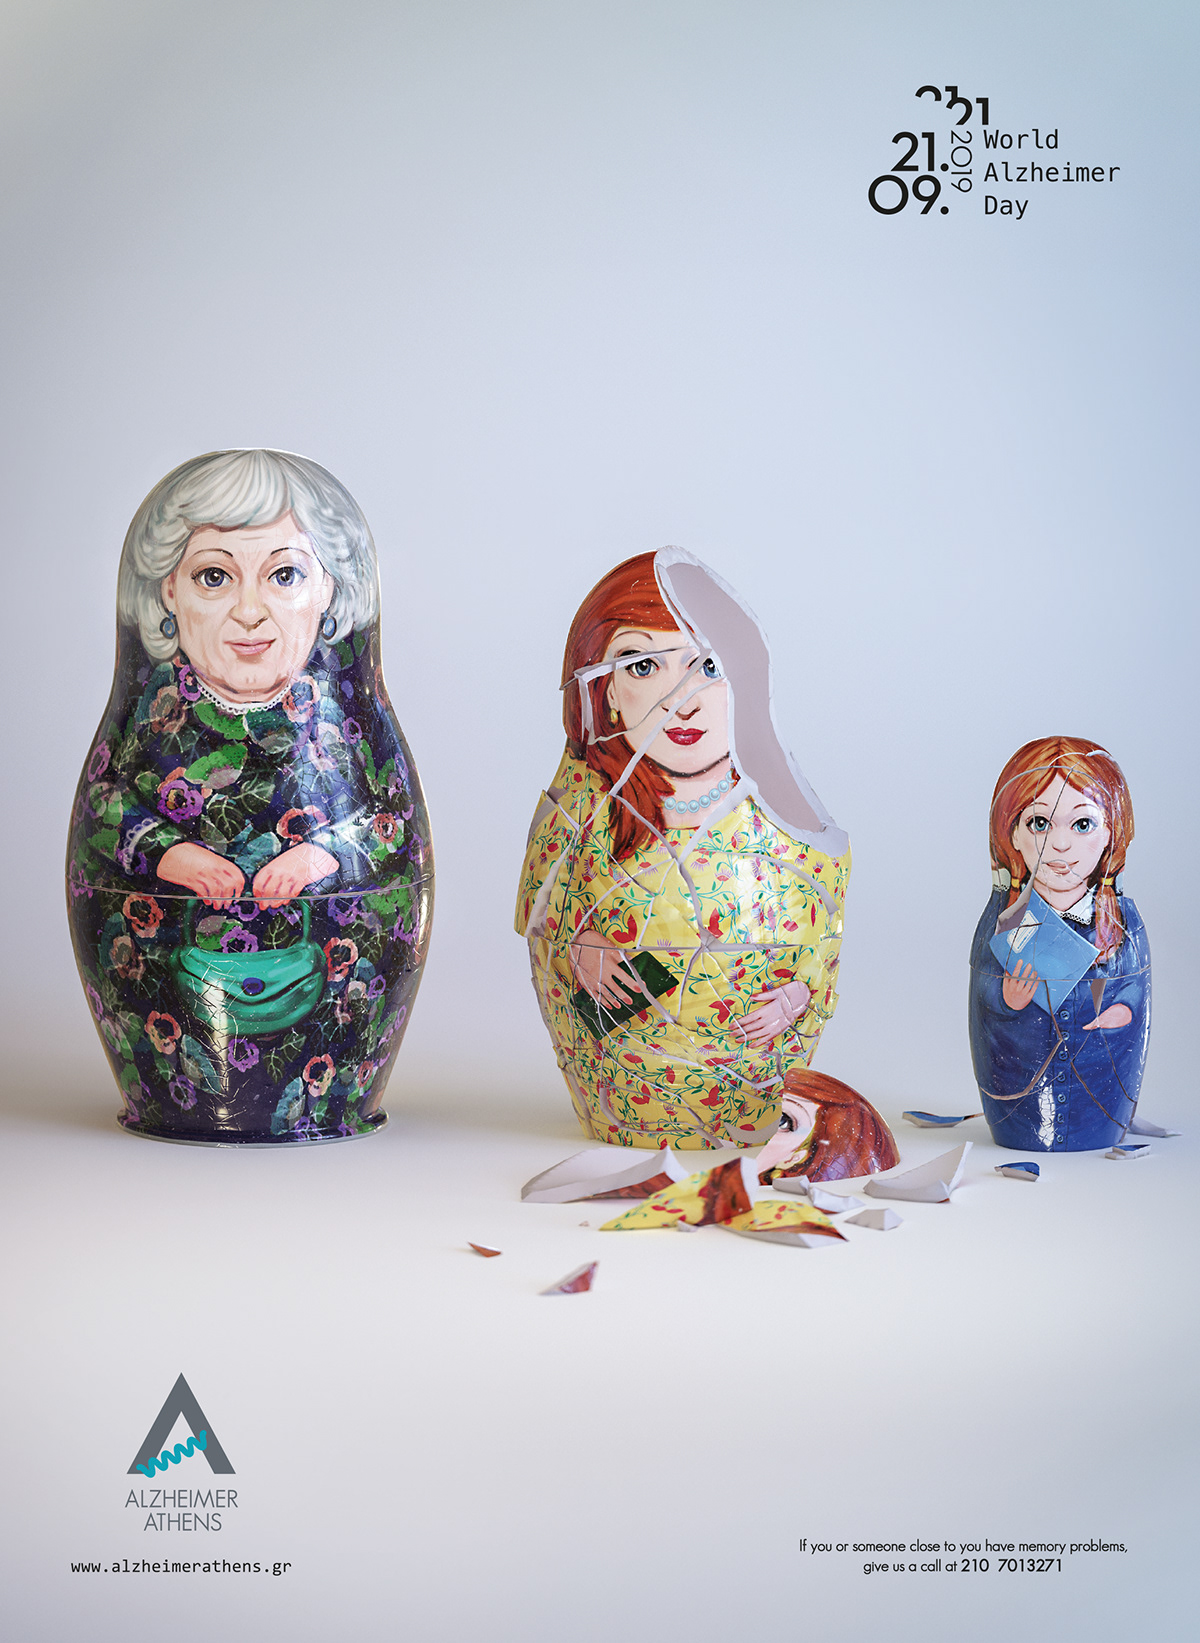 Image may contain: cartoon, human face and doll